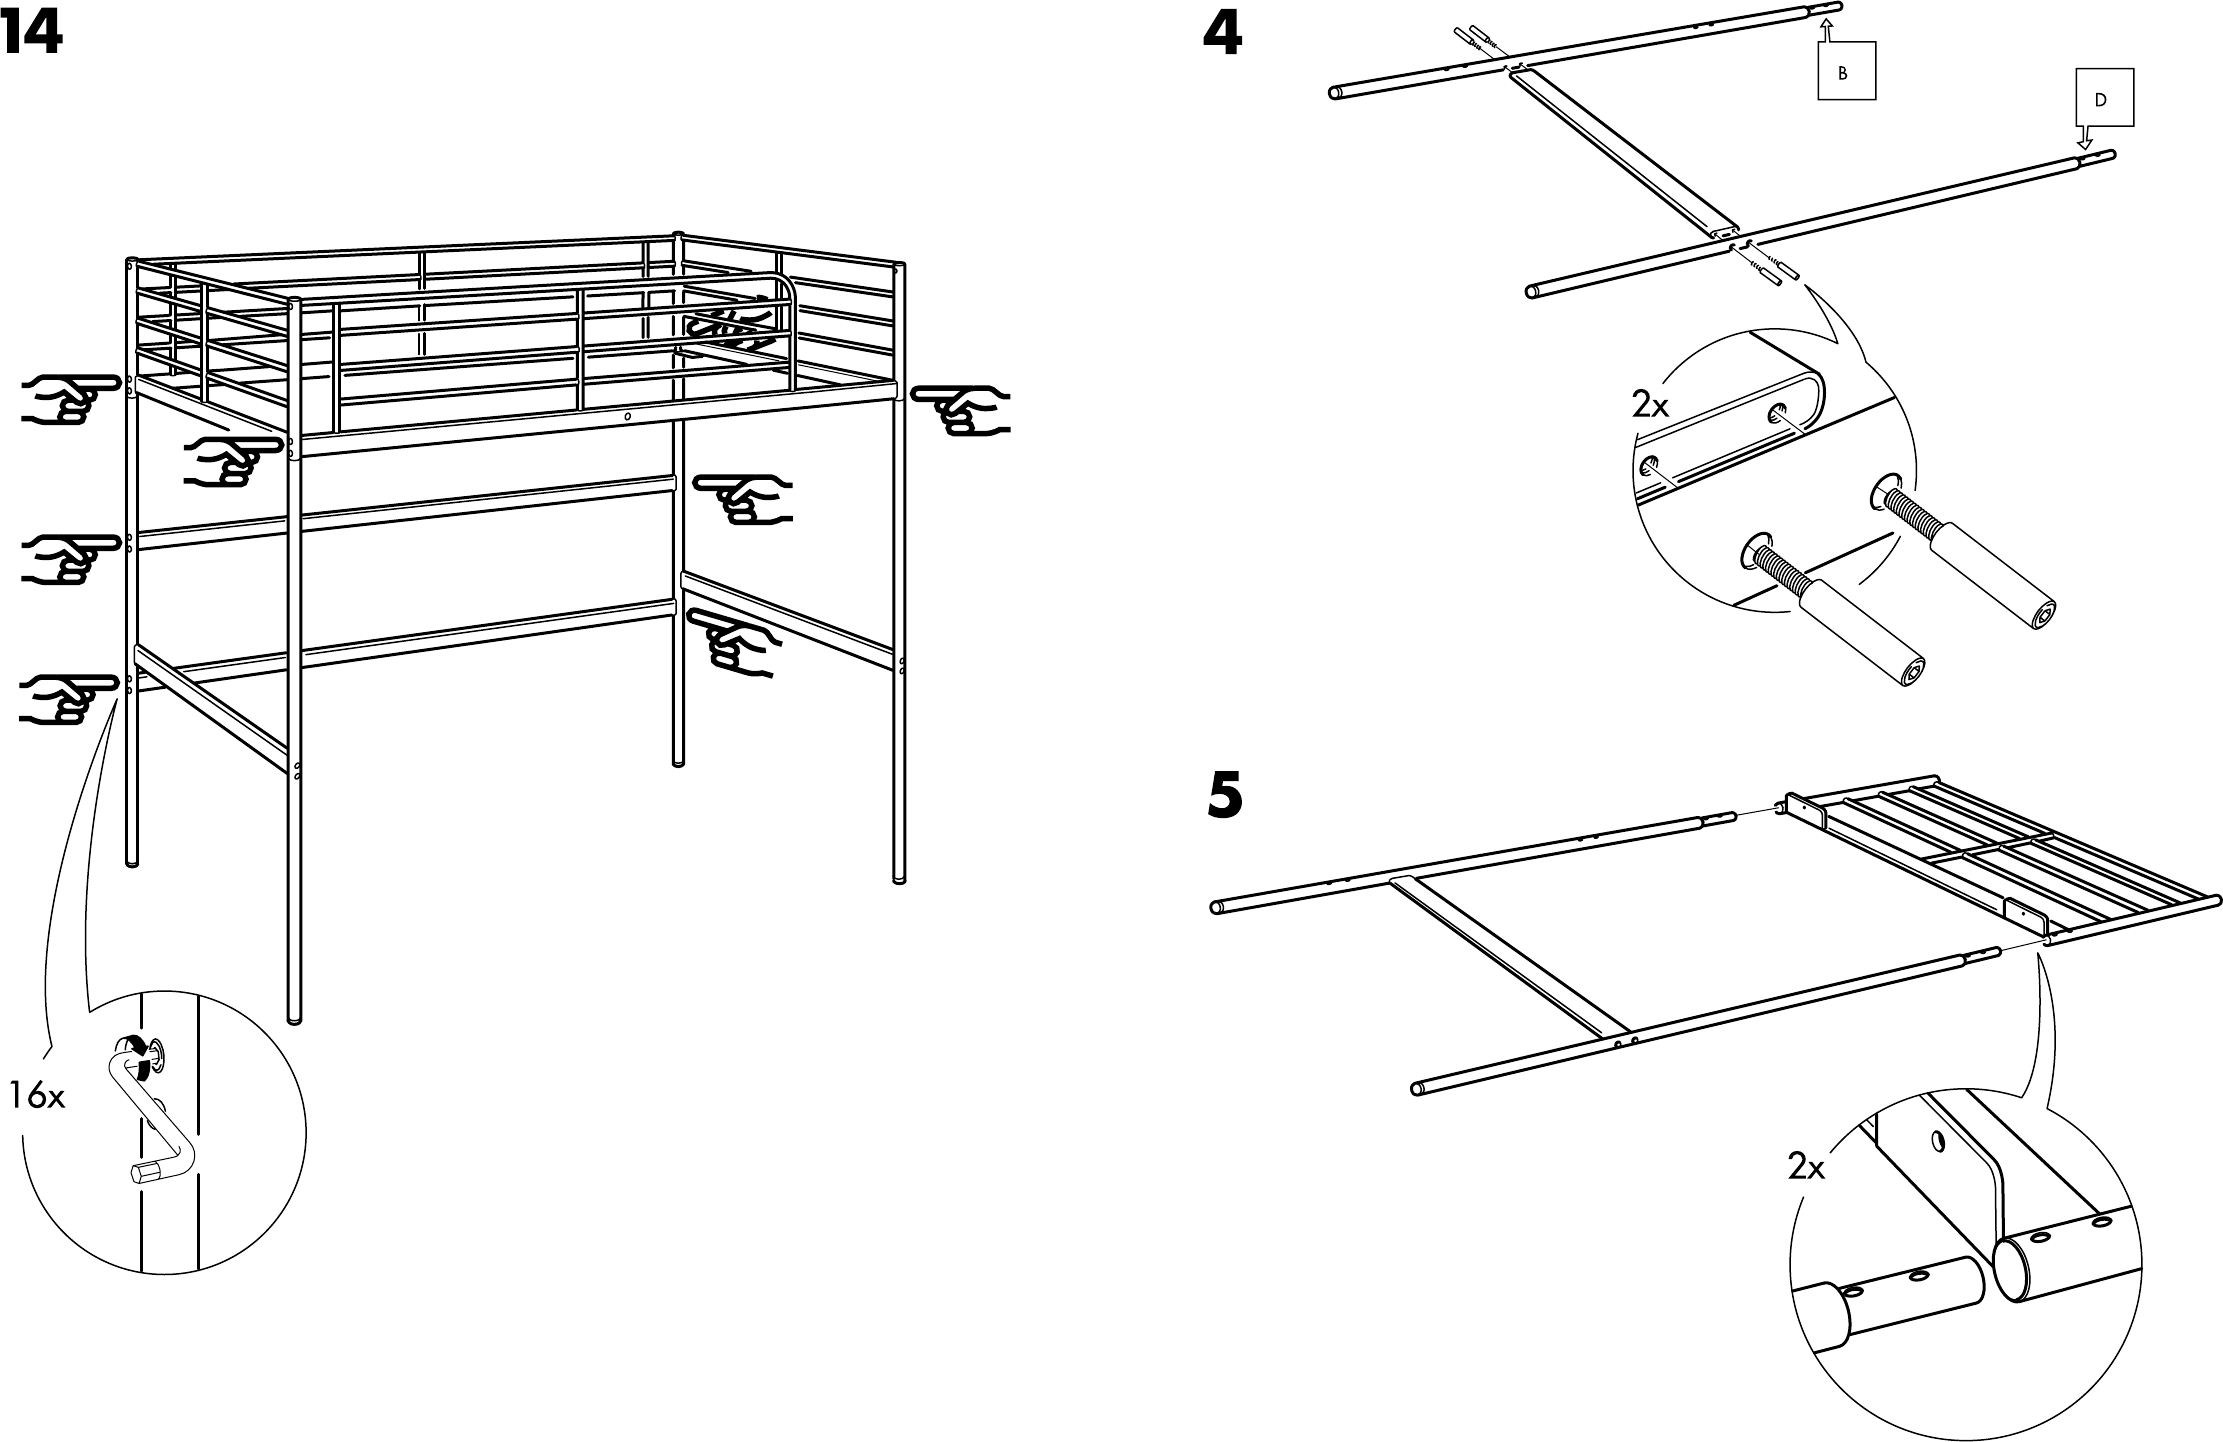 Handleiding Ikea Tromso Hoogslaper Pagina 5 Van 8 Dansk